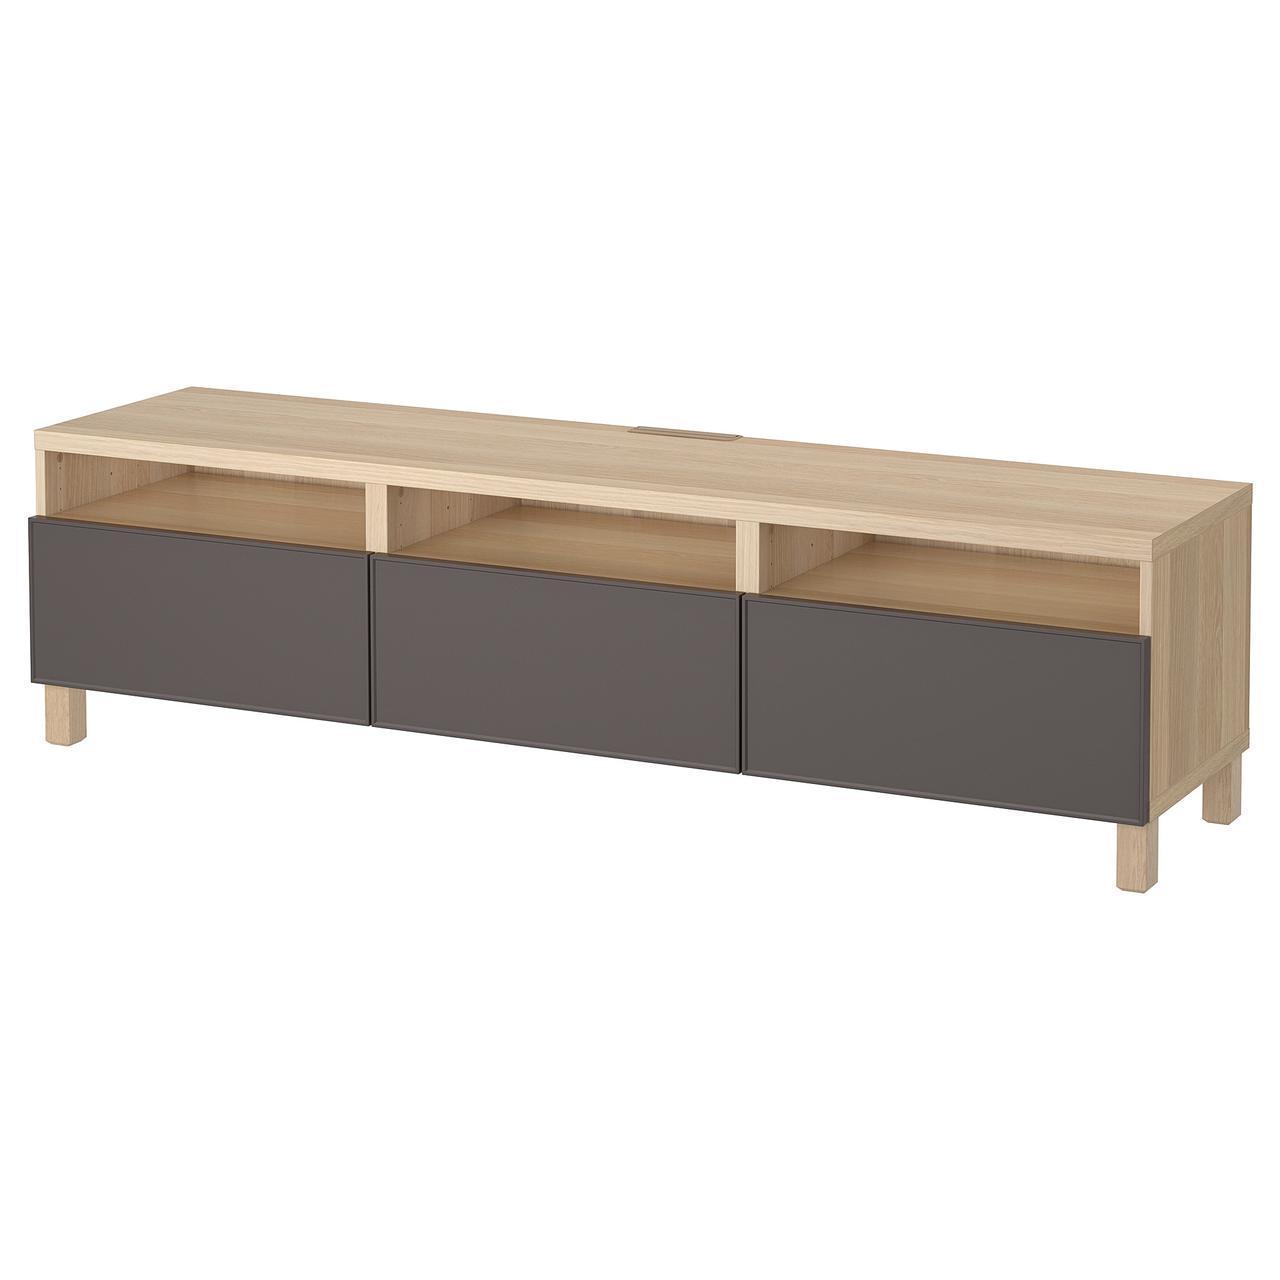 IKEA BESTA Тумба под телевизор с ящиками, белый дуб, Грундсвикен темно-серый  (892.057.67)